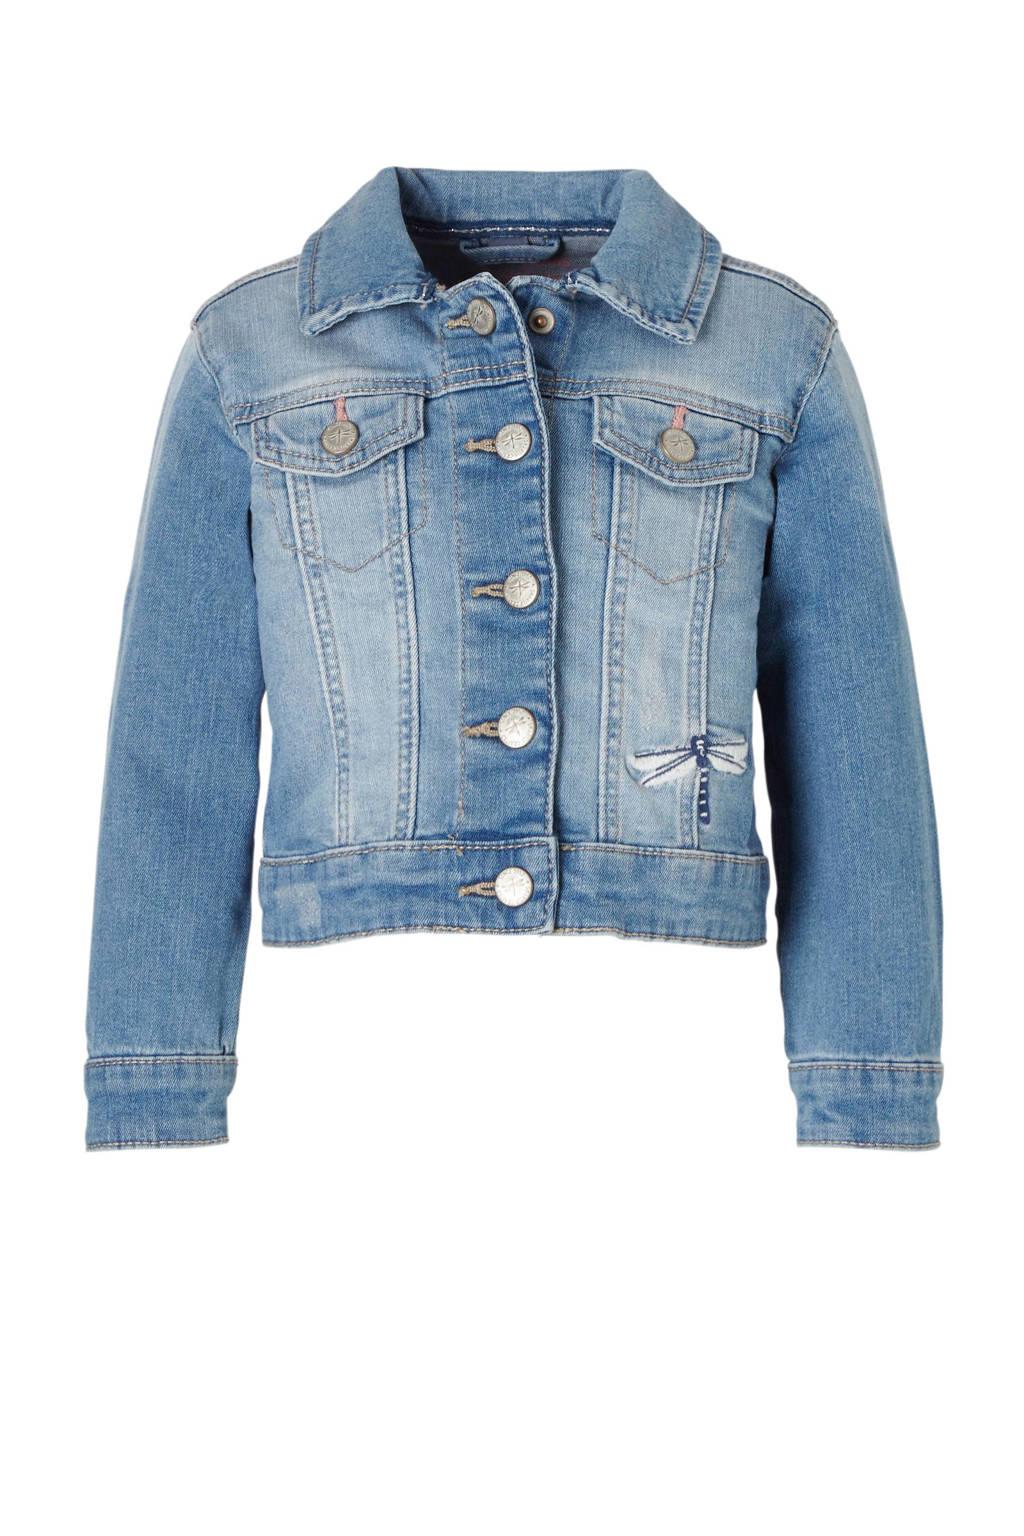 C&A Palomino spijkerjas blauw, Light denim